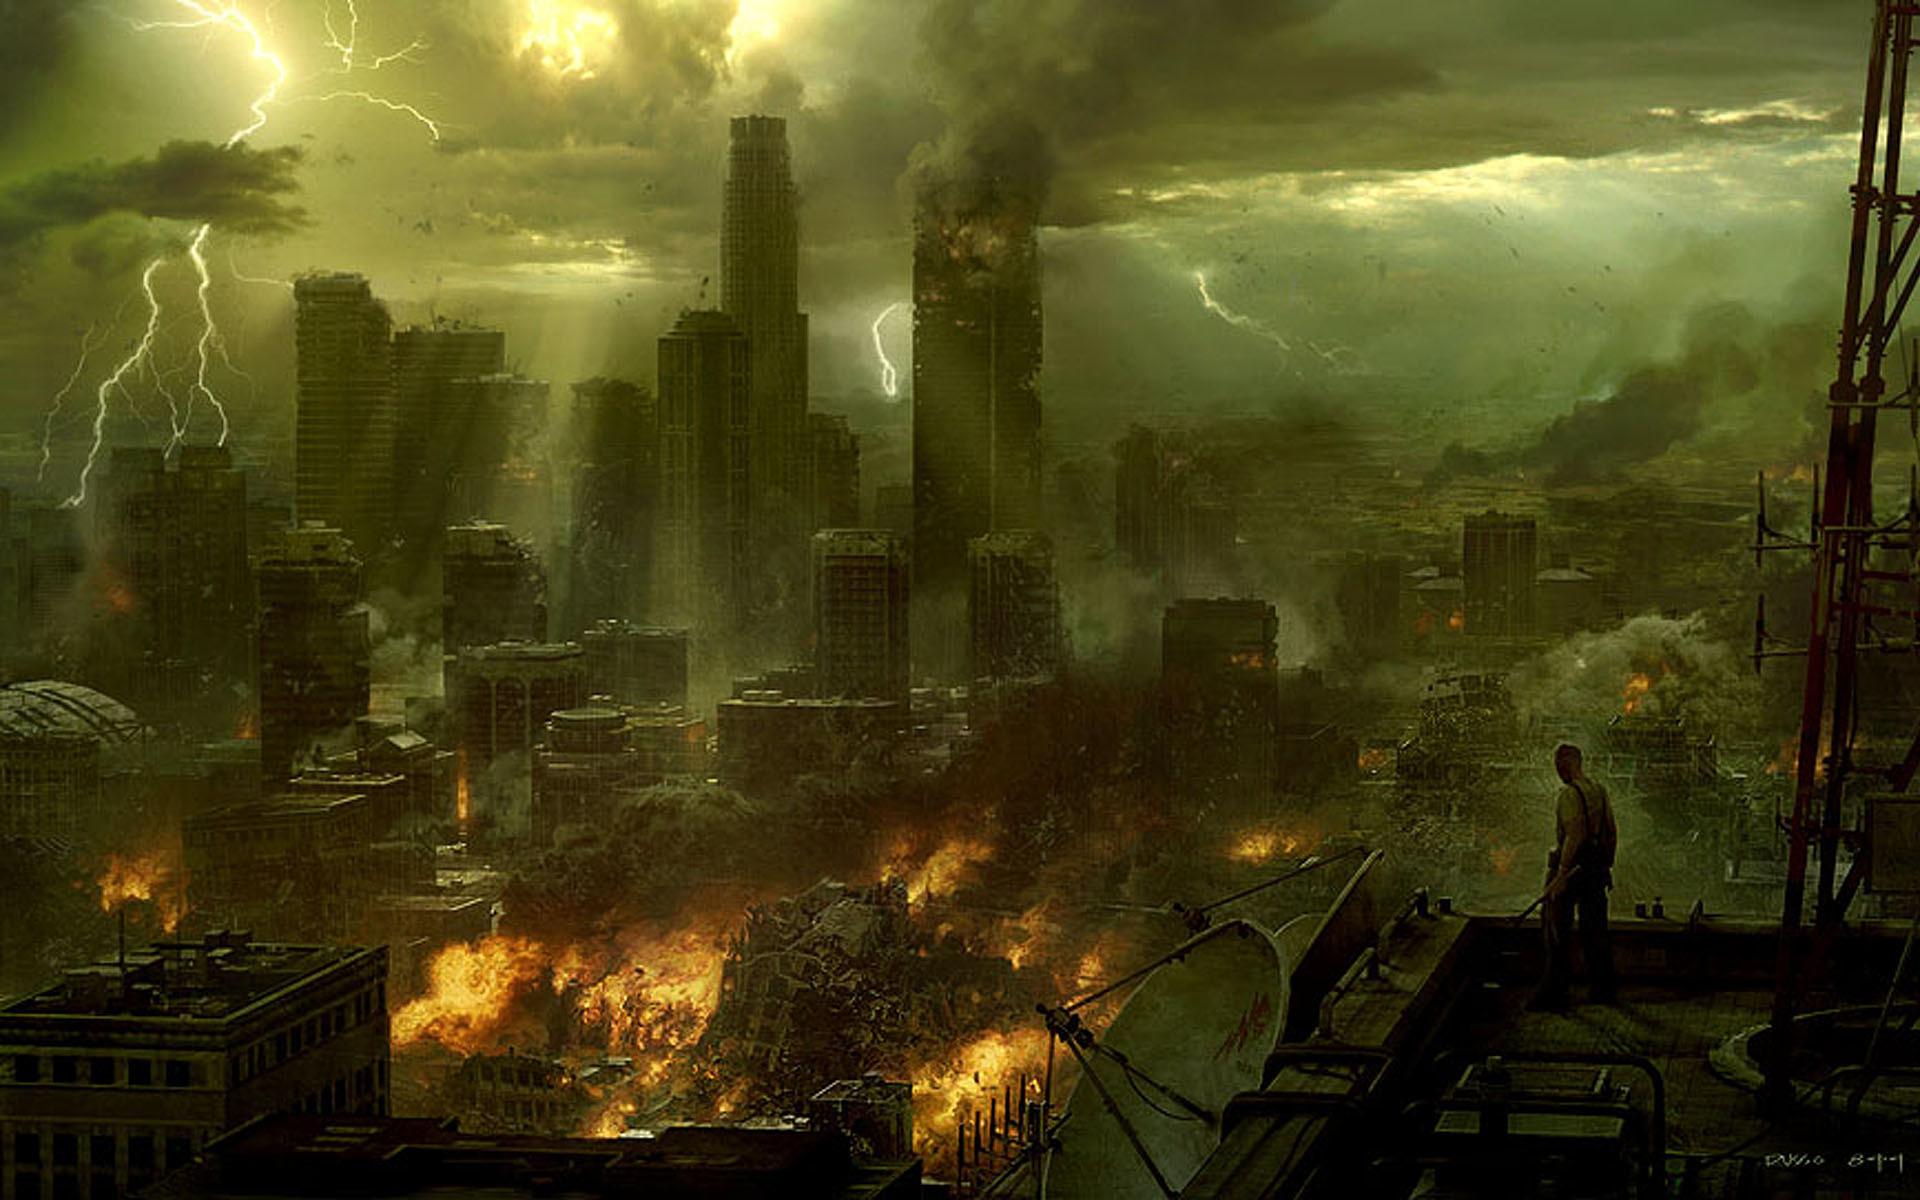 Doomsday Wallpaper 69 Pictures